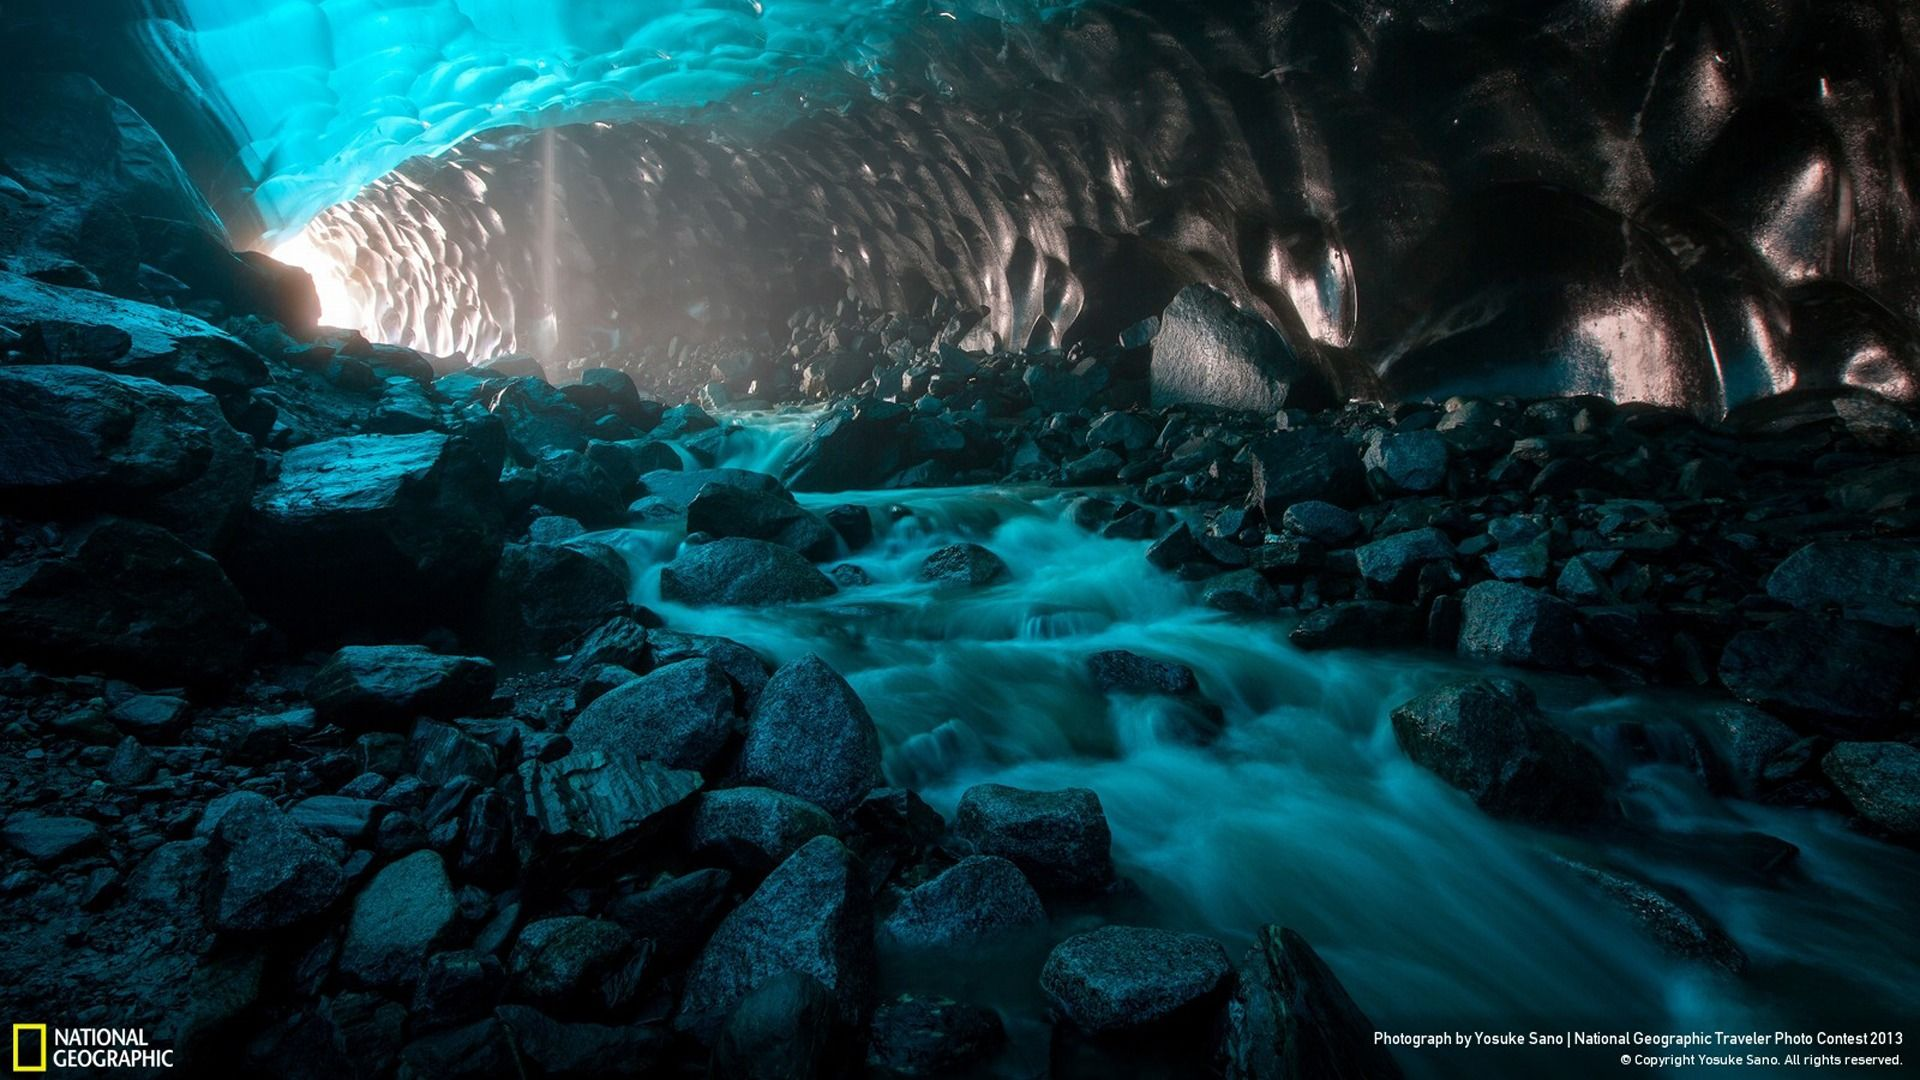 Cave Blue wallpaper image